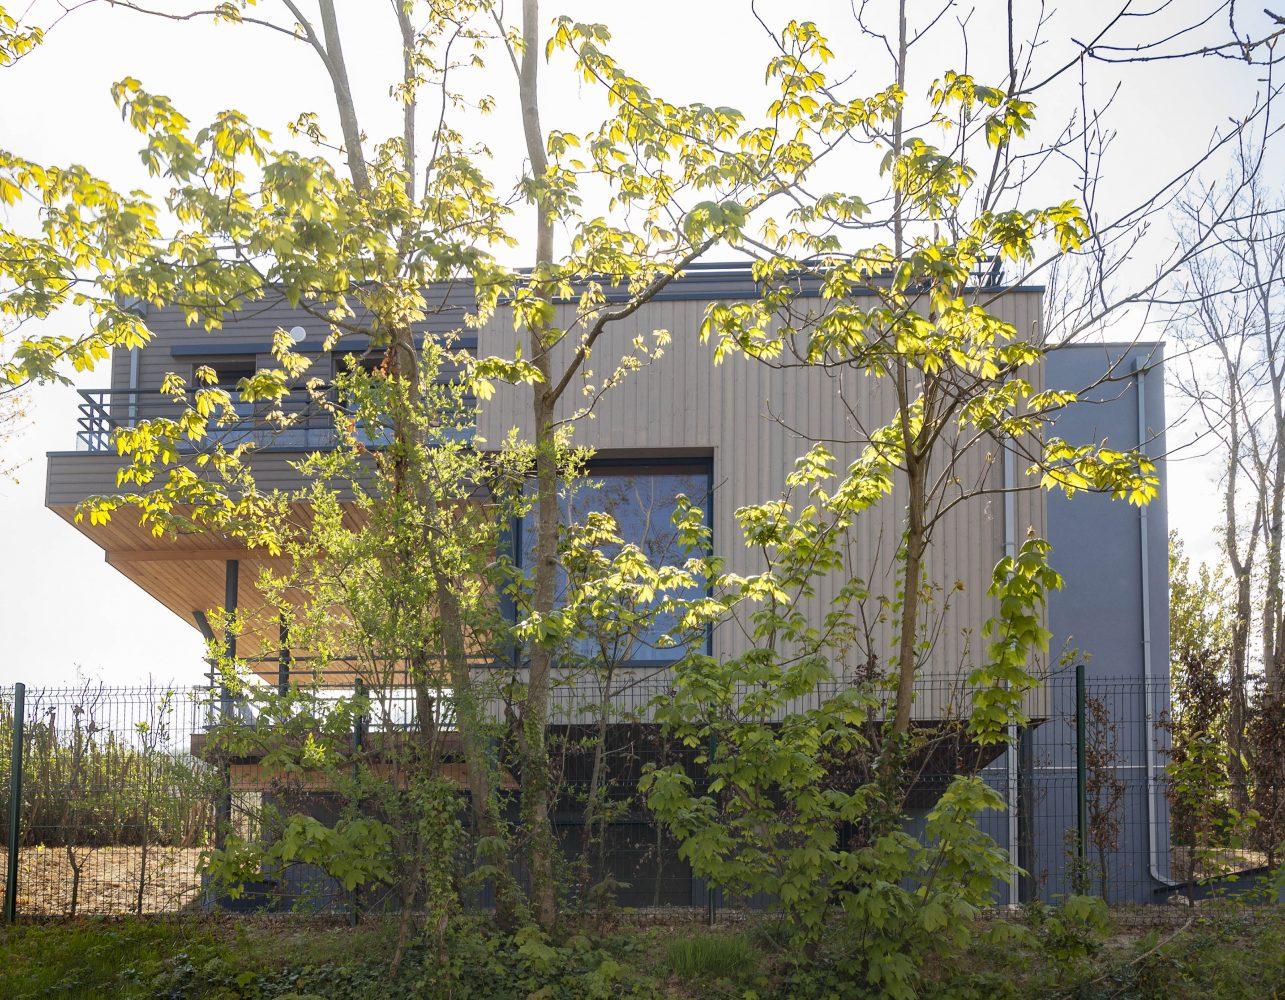 Philippe_Zerbib_Architecte_construction_maisons_ossature_bois_projet_maison_benhamou_MG_8485